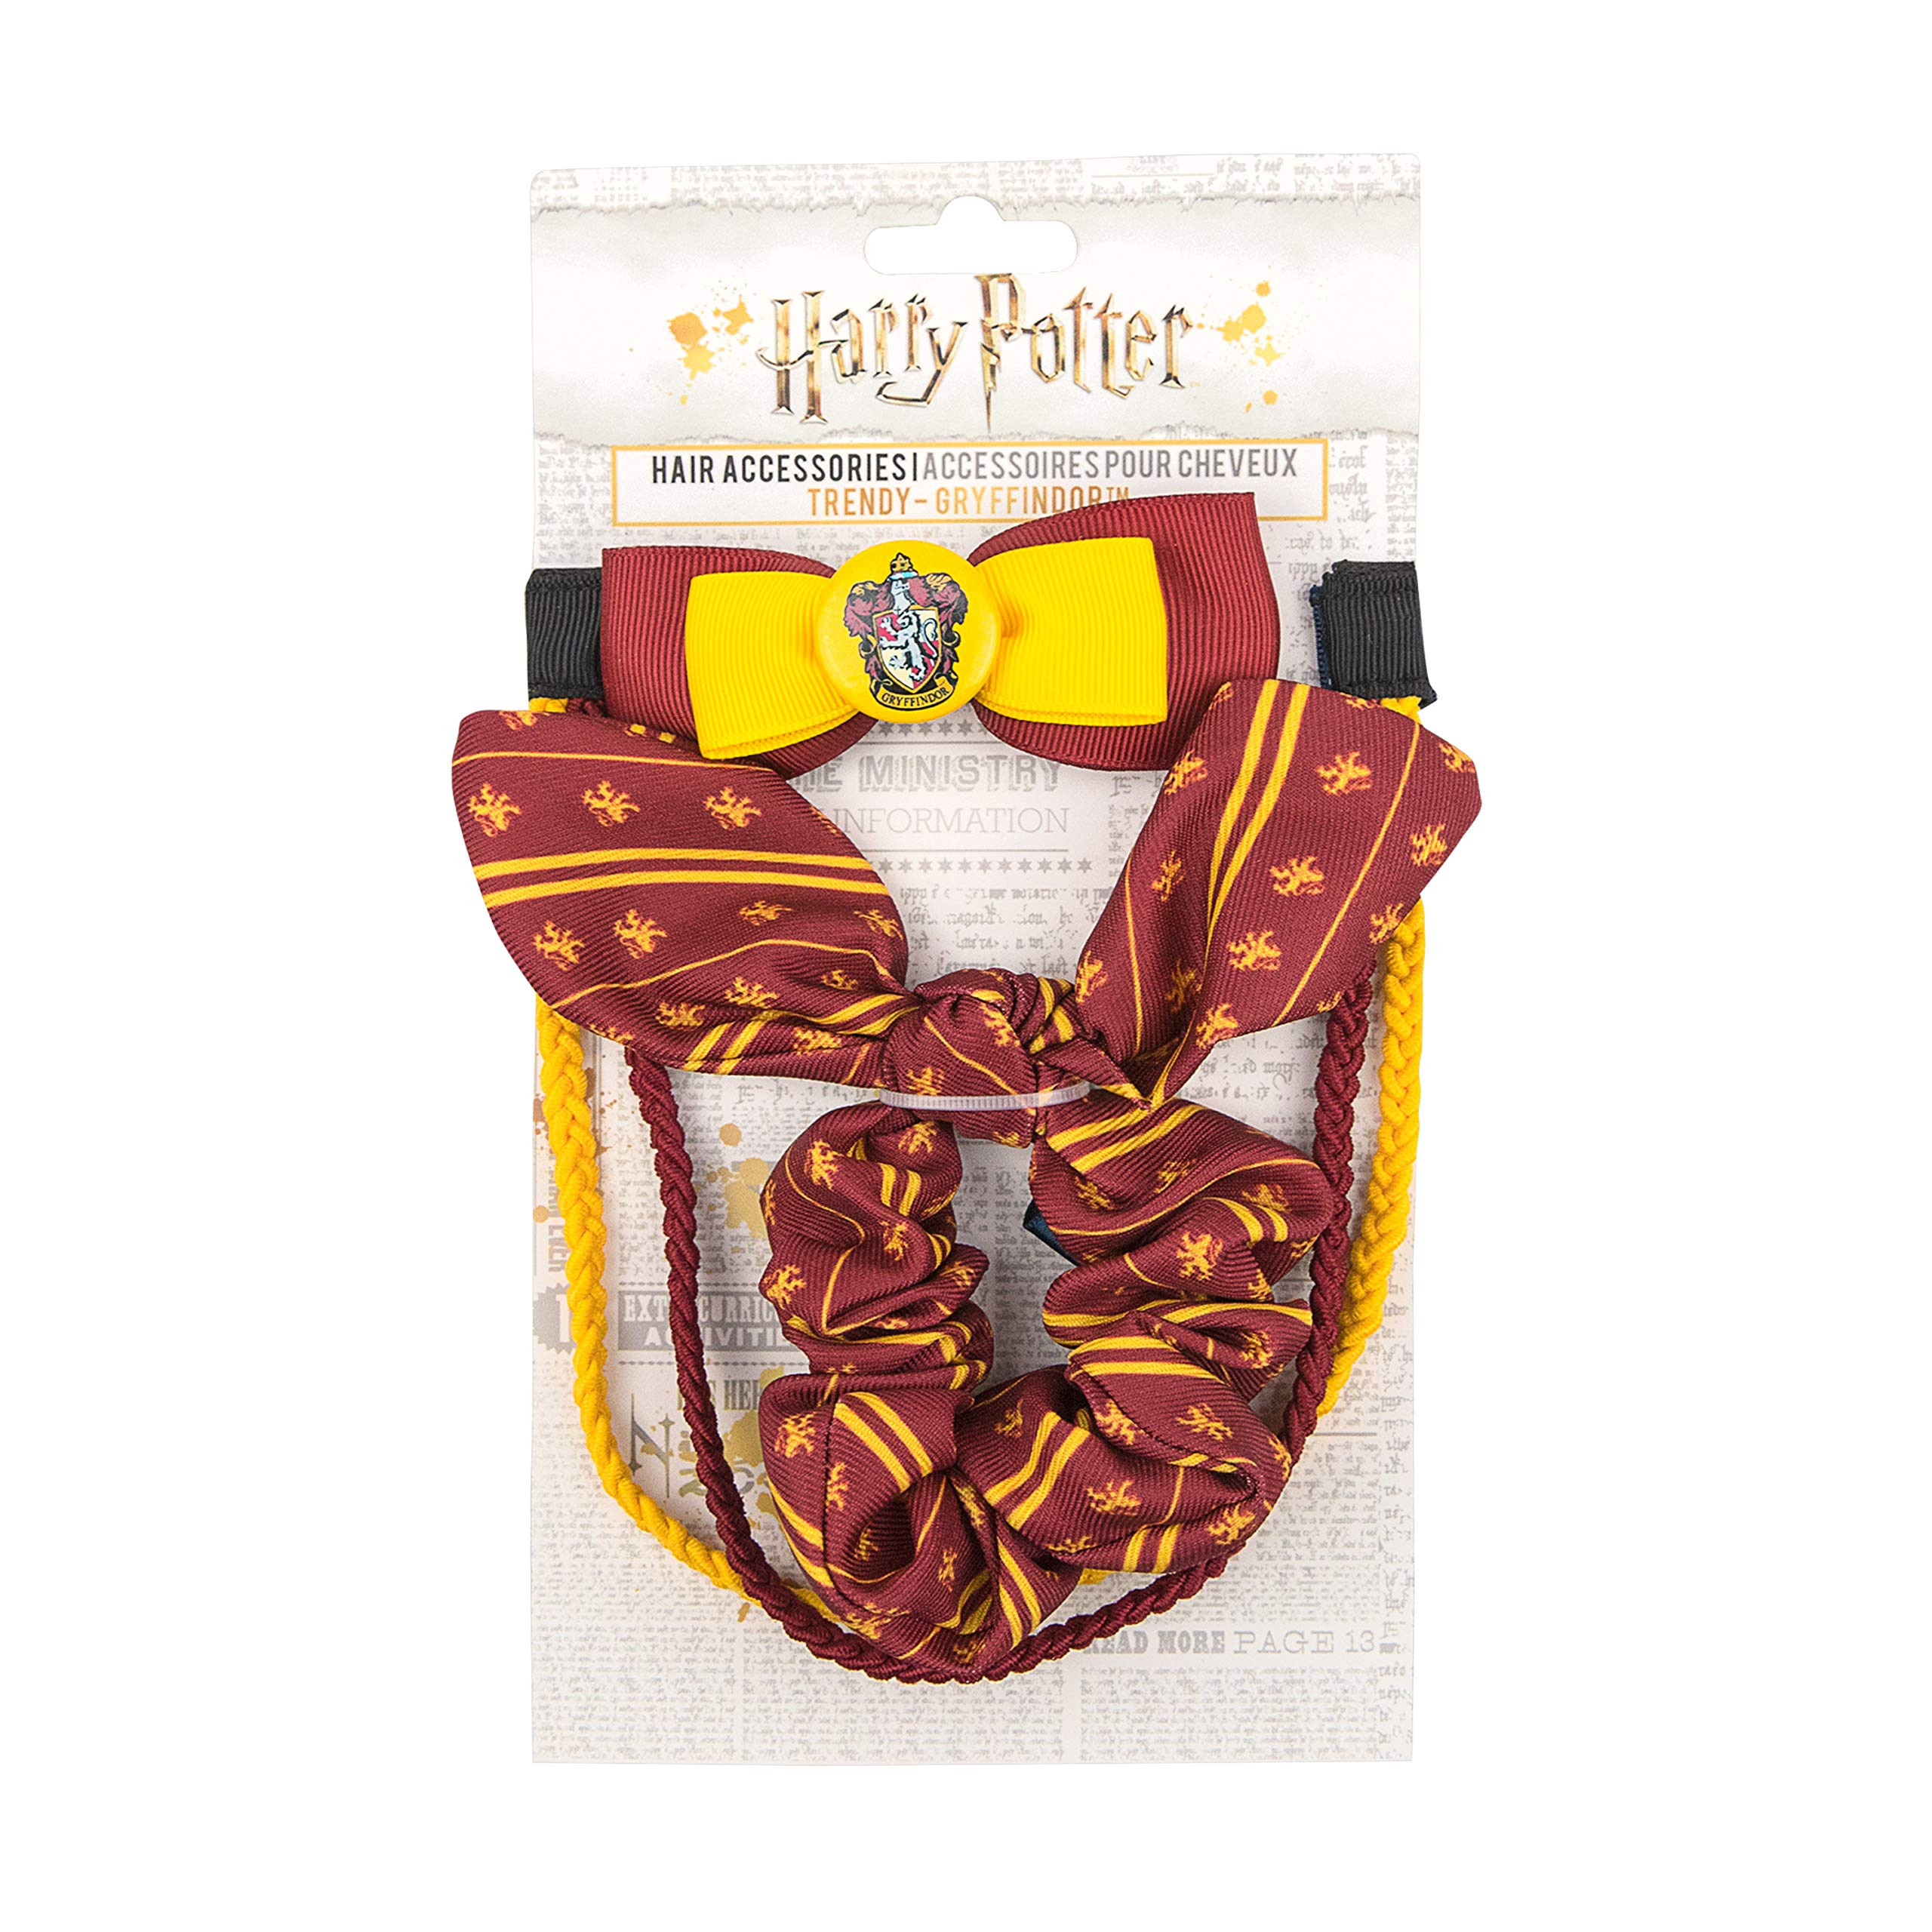 Harry Potter - Hair Accessories (Trendy (Bunny Ear, Clip, Double Headband), Gryffindor) by Cinereplicas